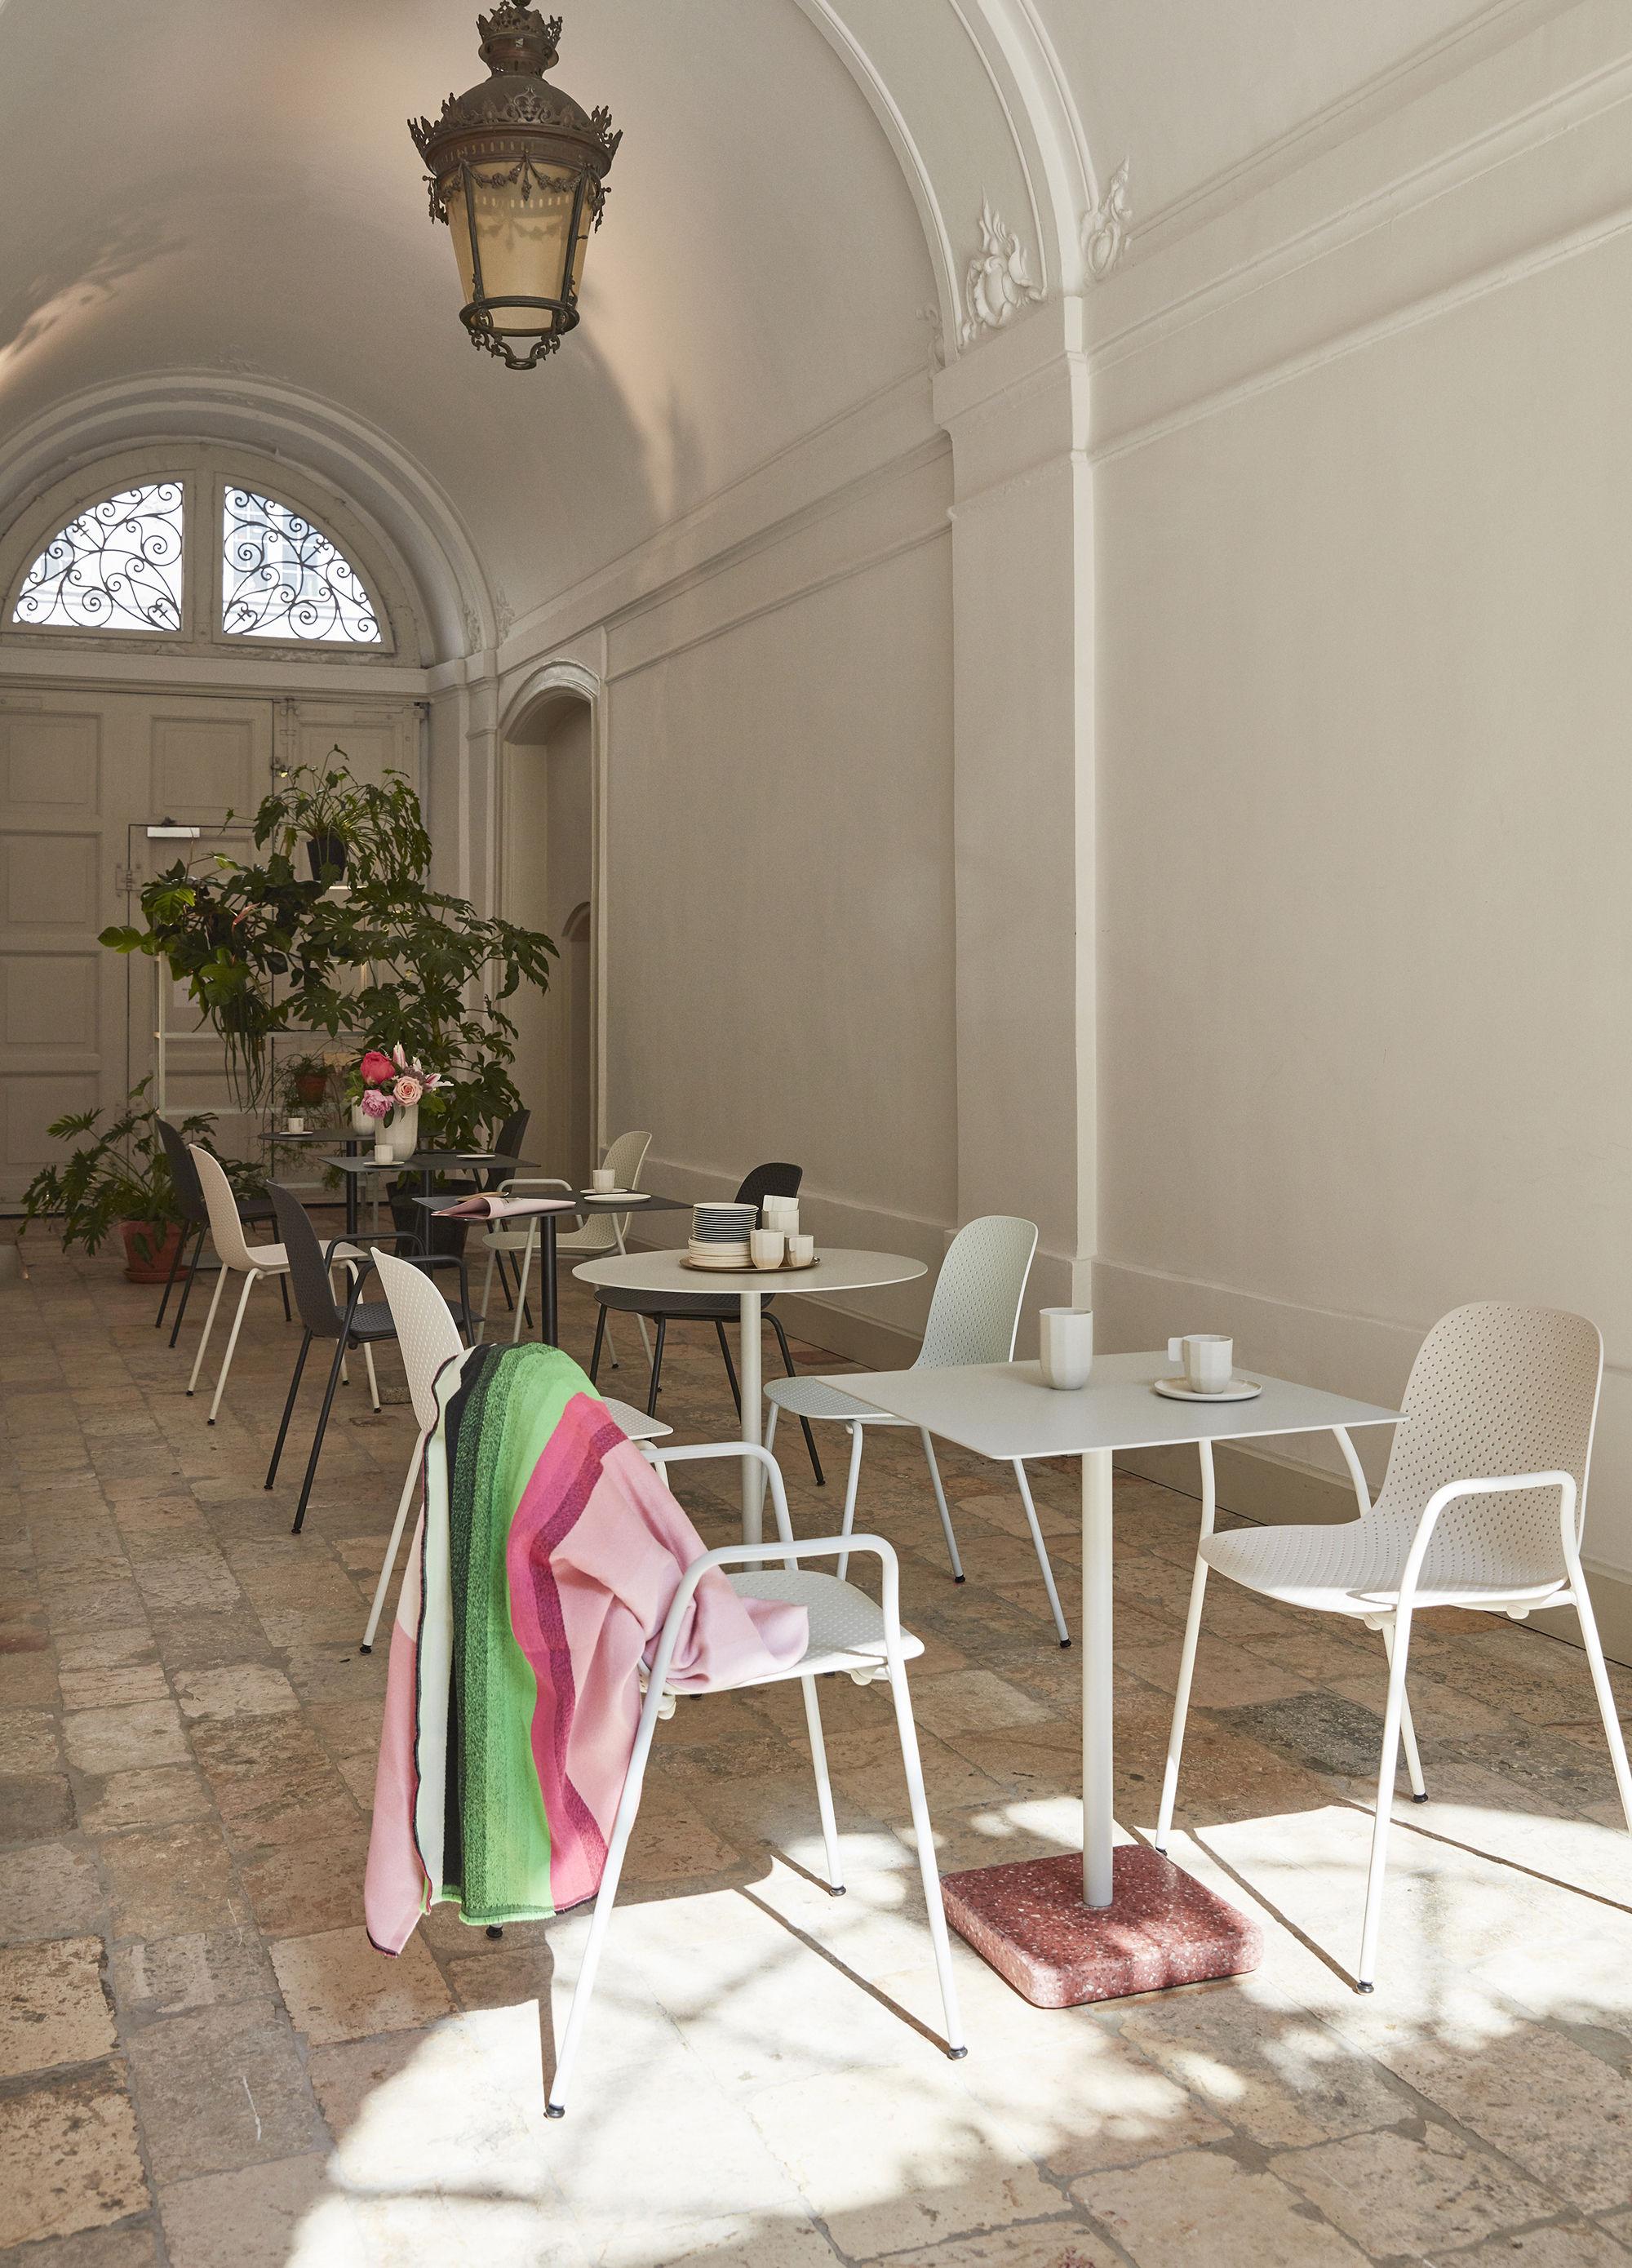 13eighty kunststoff perforiert hay stapelbarer sessel. Black Bedroom Furniture Sets. Home Design Ideas